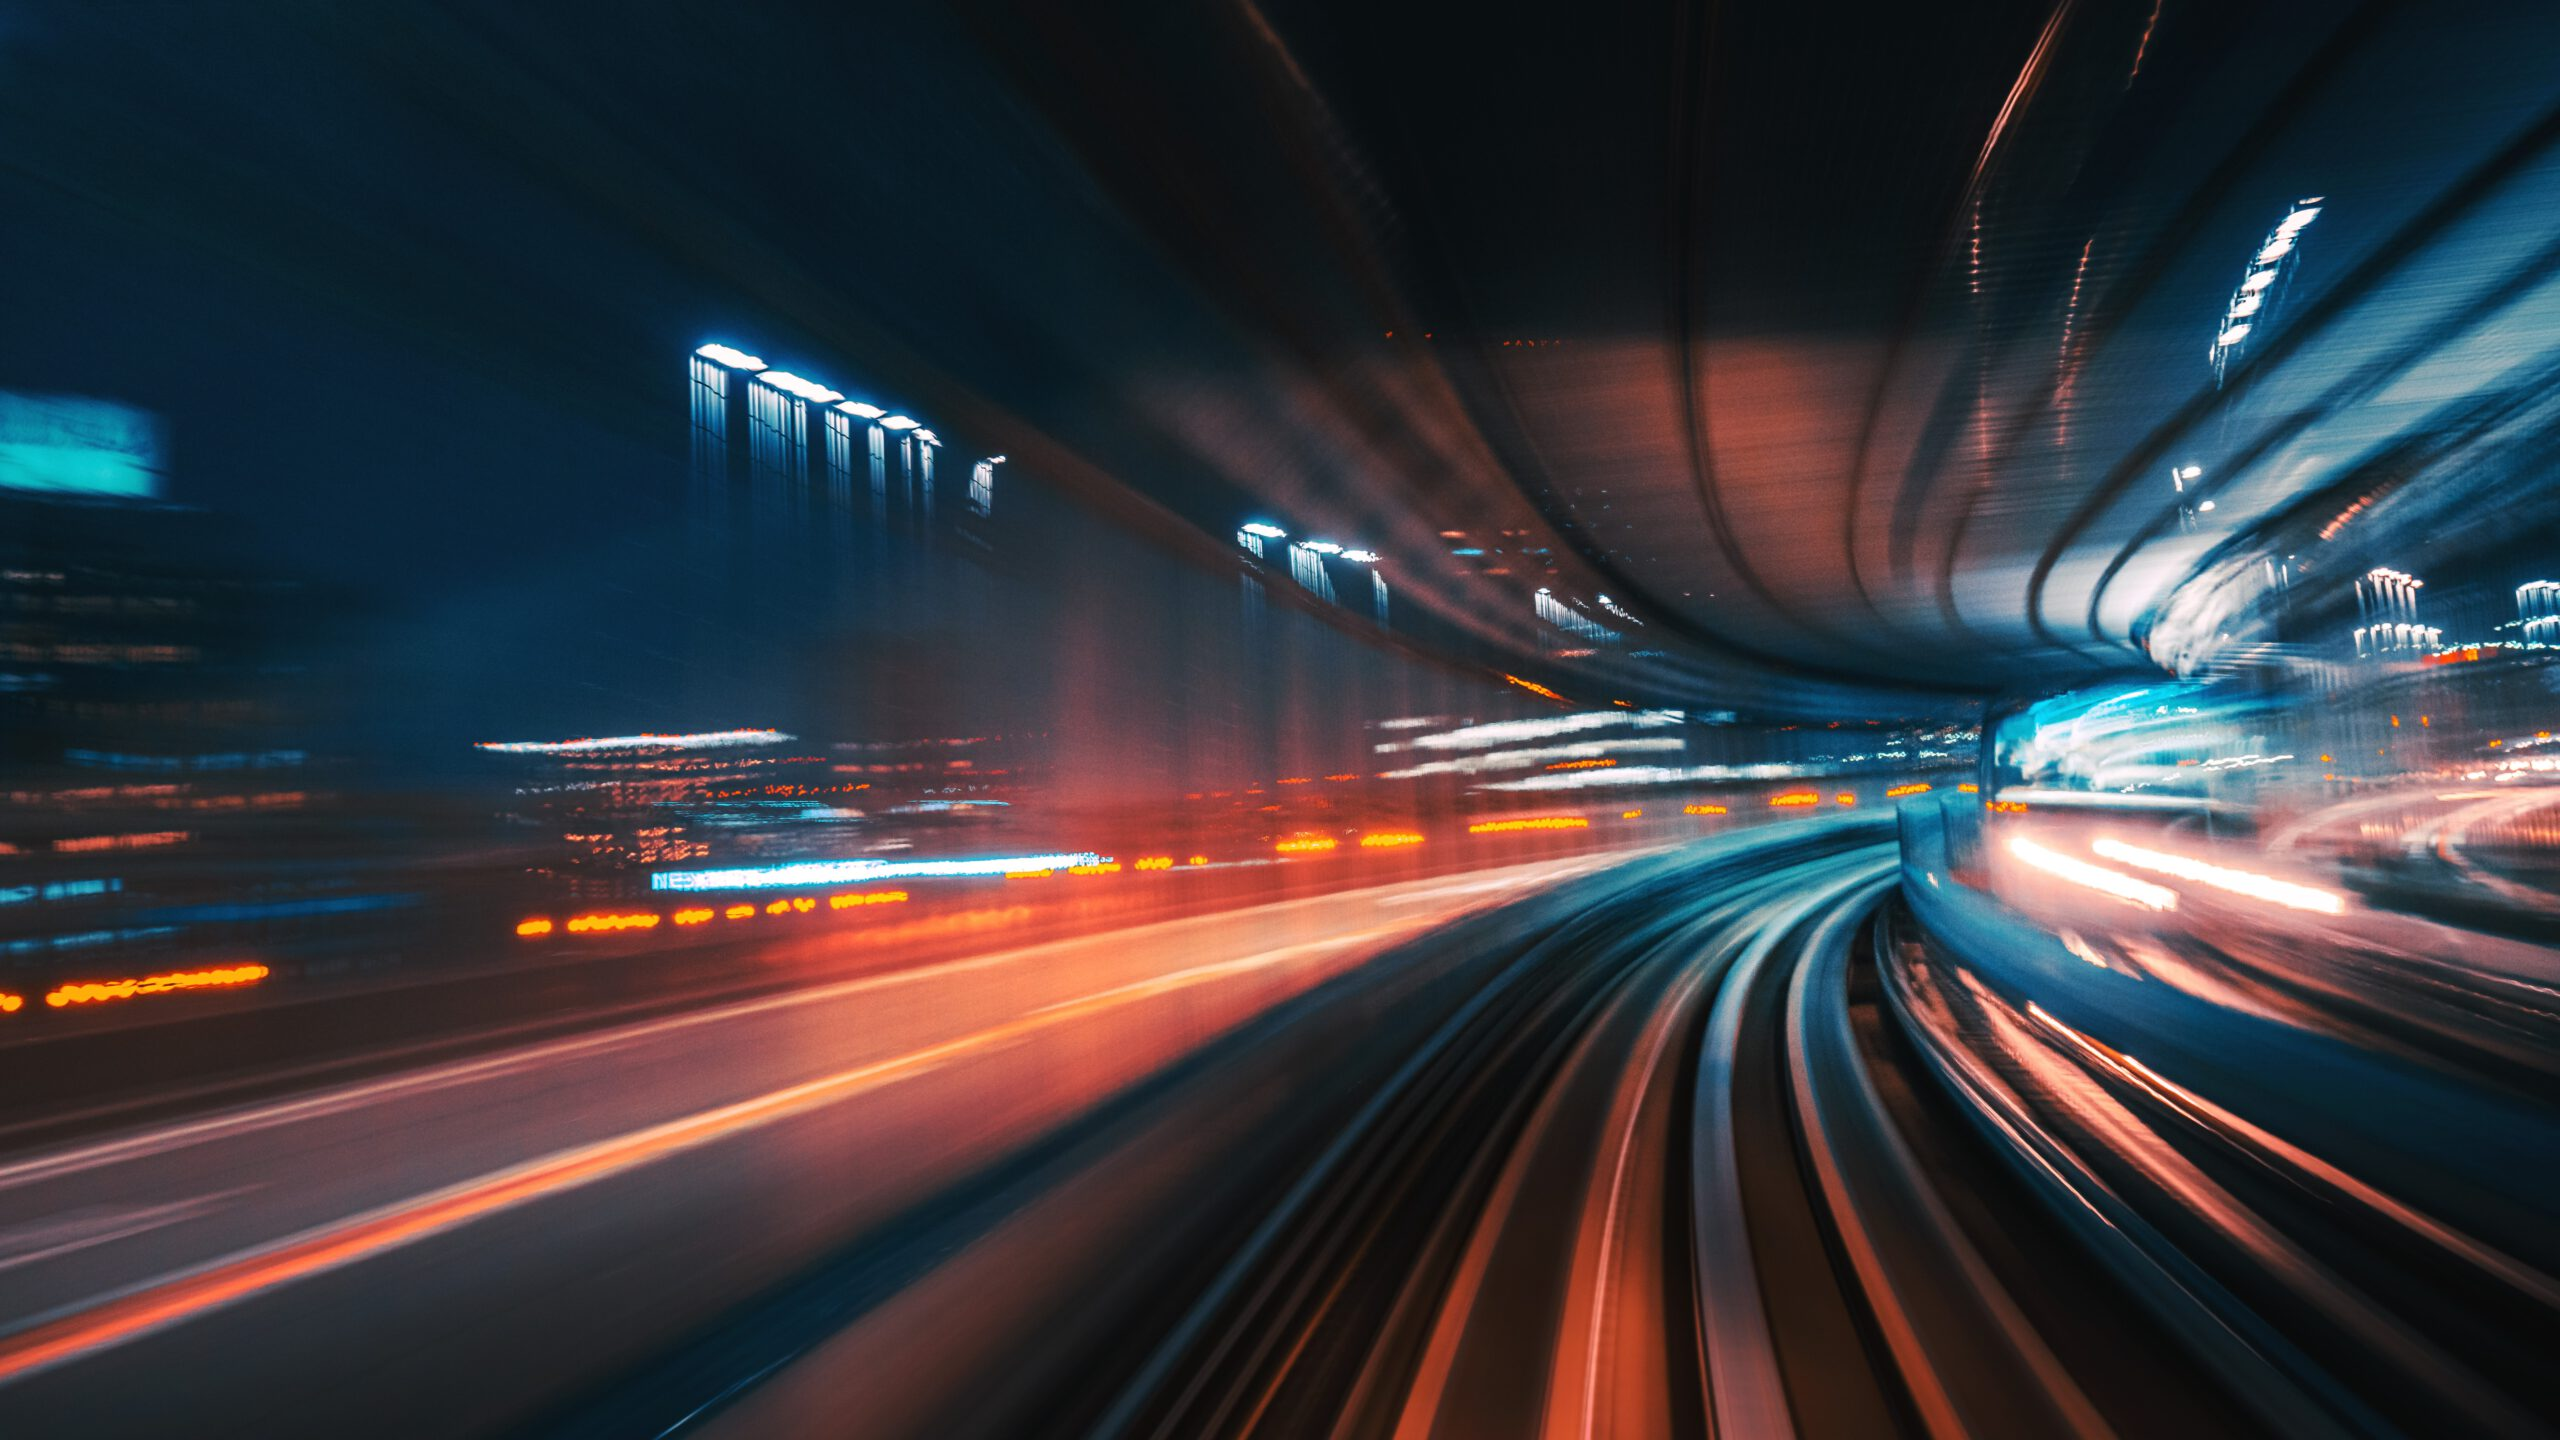 High Speed Motion Blur driving through a tunnel at night  Futuristic High Speed Monorail Train Tokyo, Japan